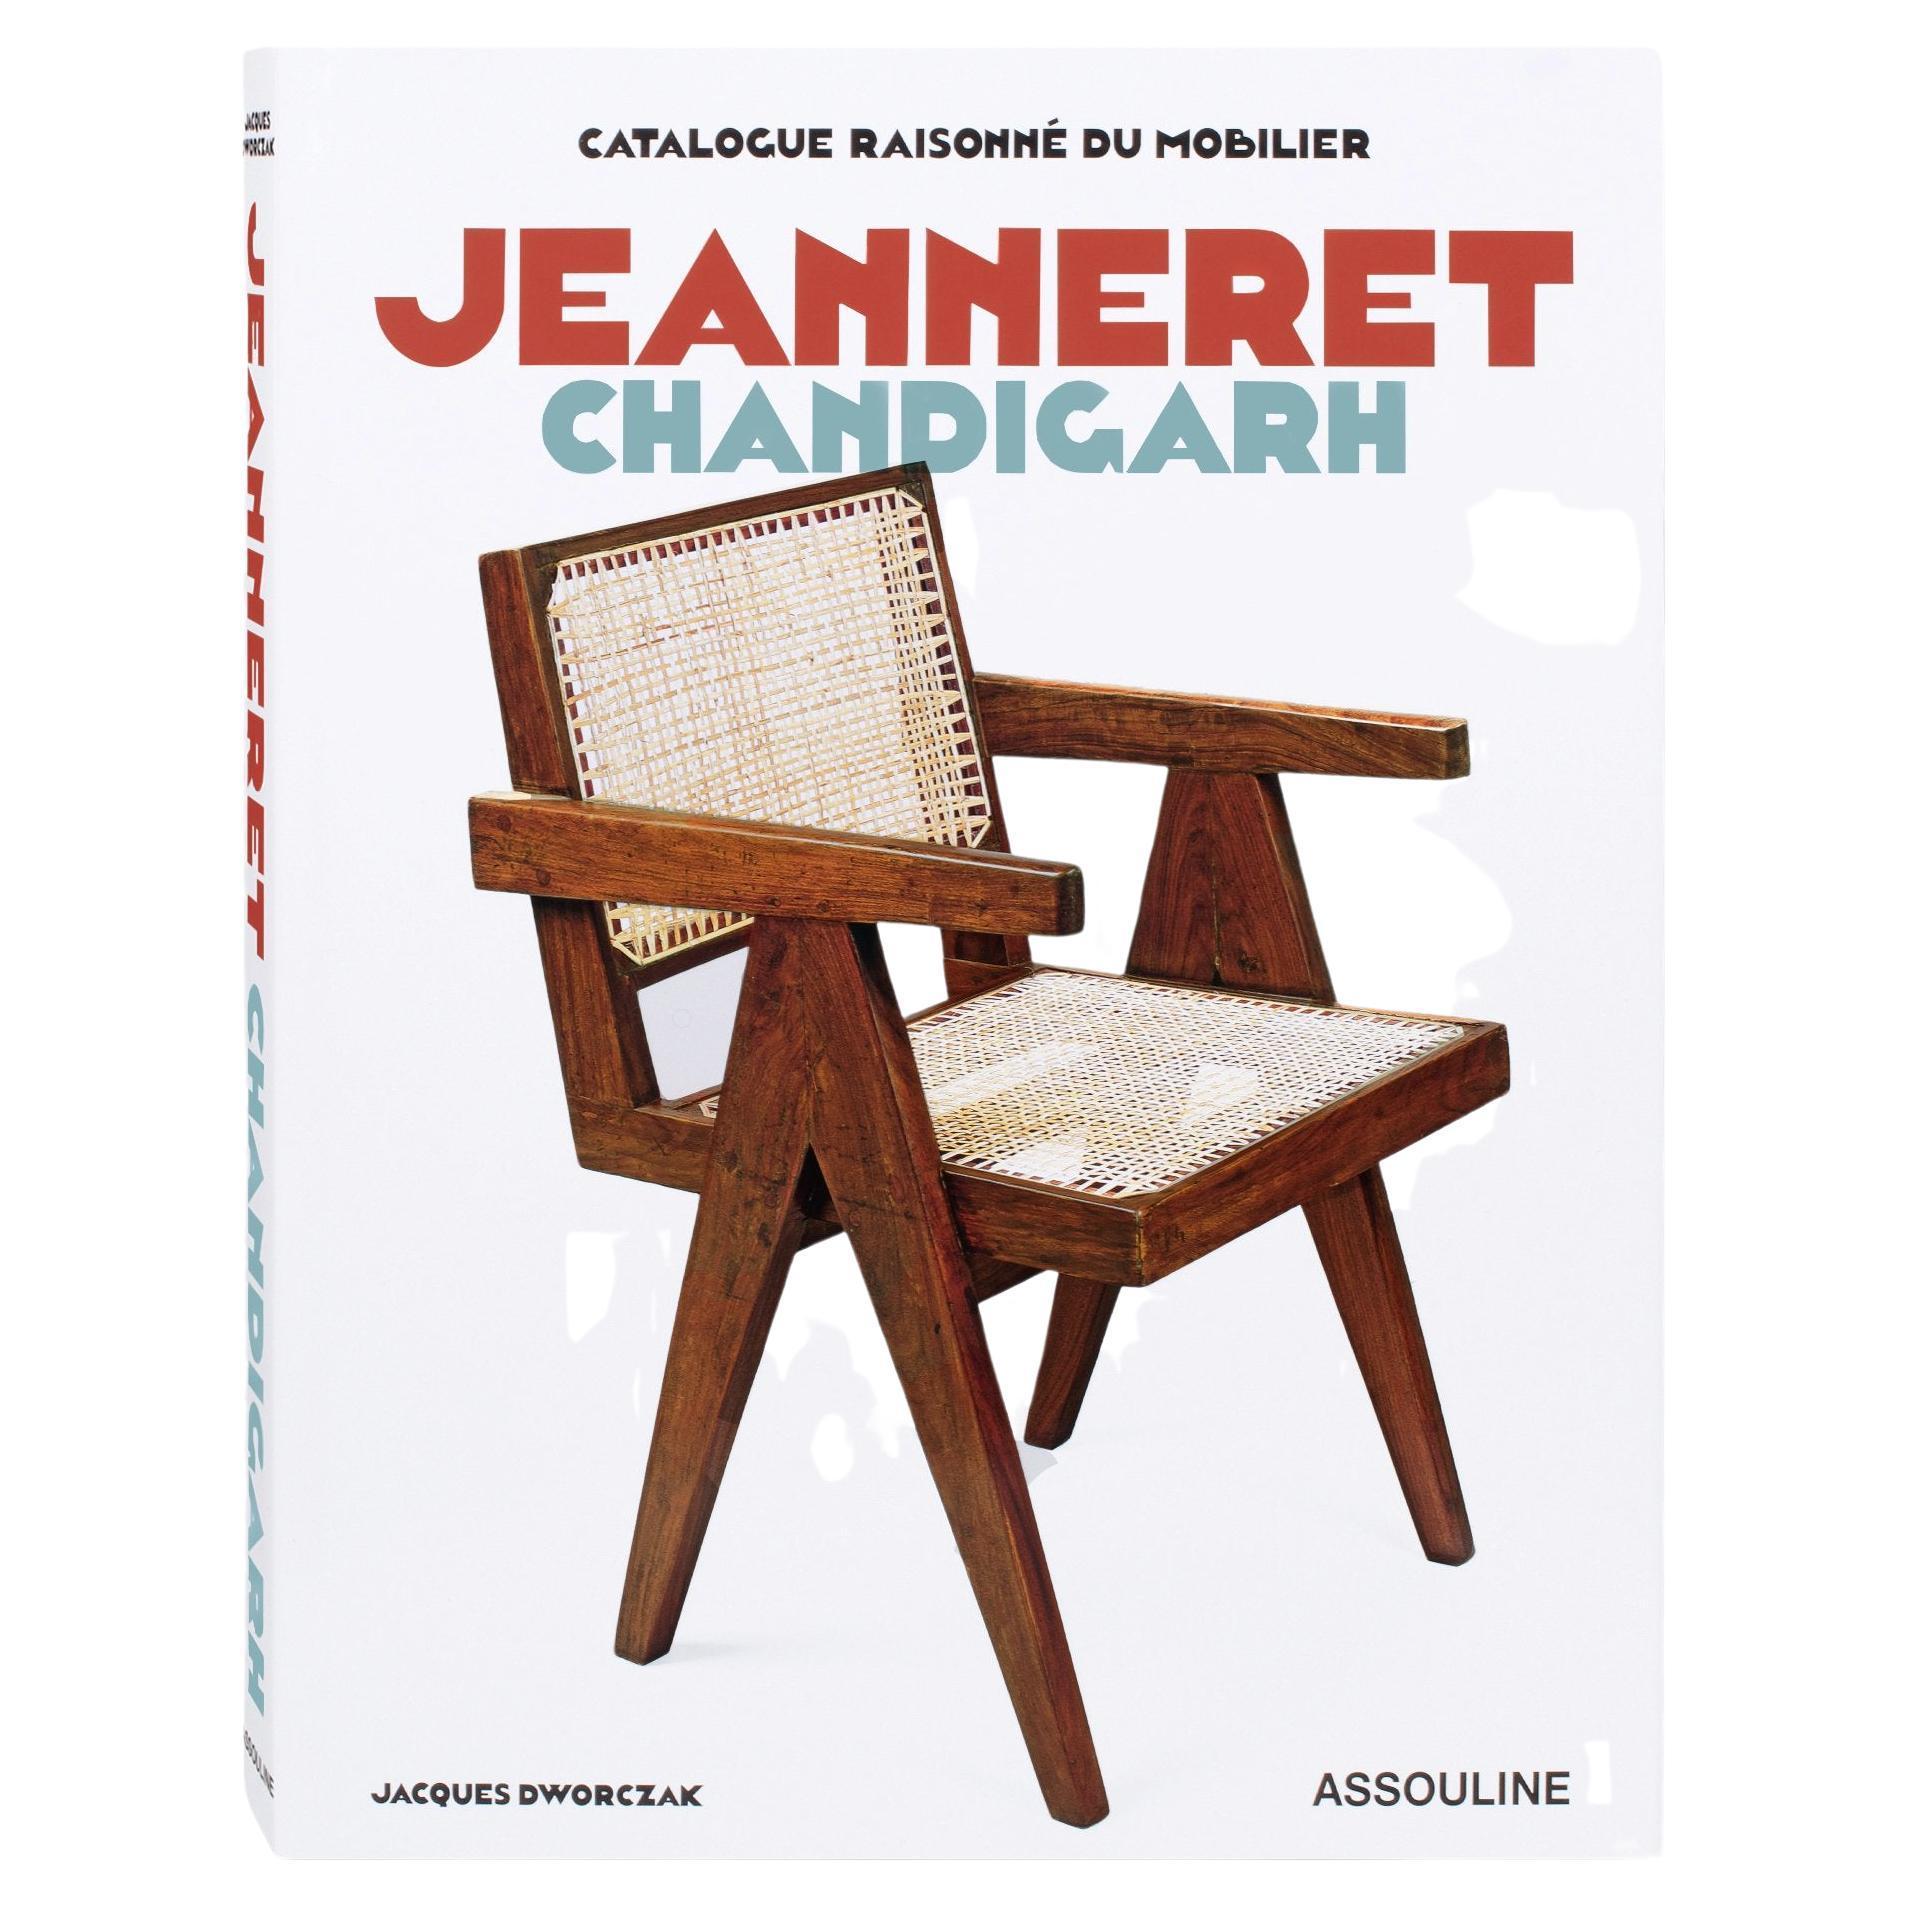 in Stock in Los Angeles, Jeanneret Chandigarh Catalogue Raisonné Du Mobilier